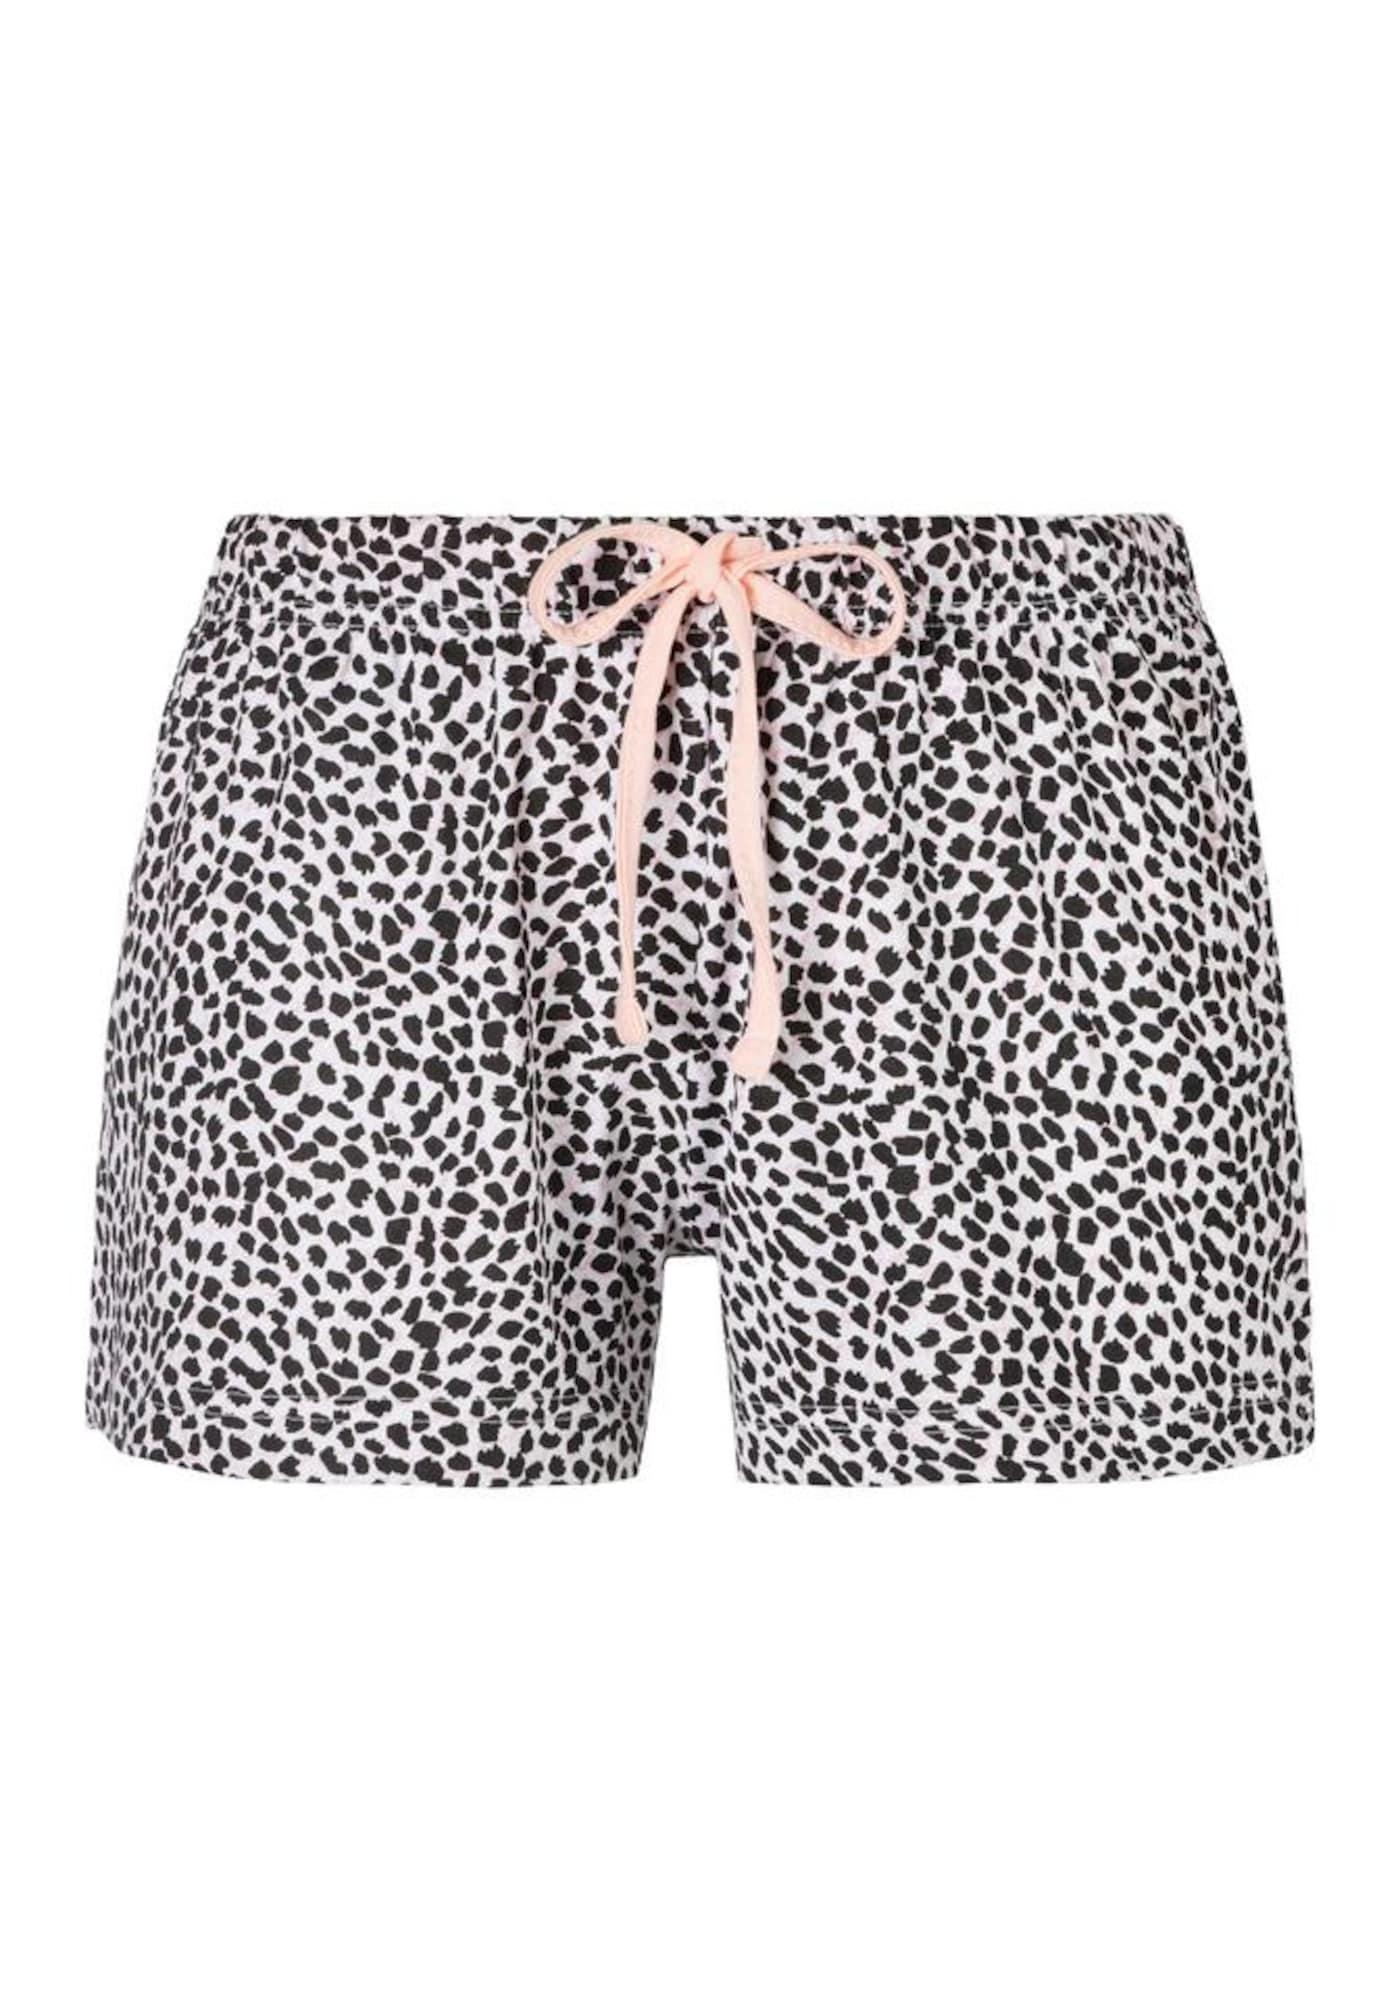 VIVANCE Pantalon de pyjama 'Dreams'  - Noir - Taille: XS - female